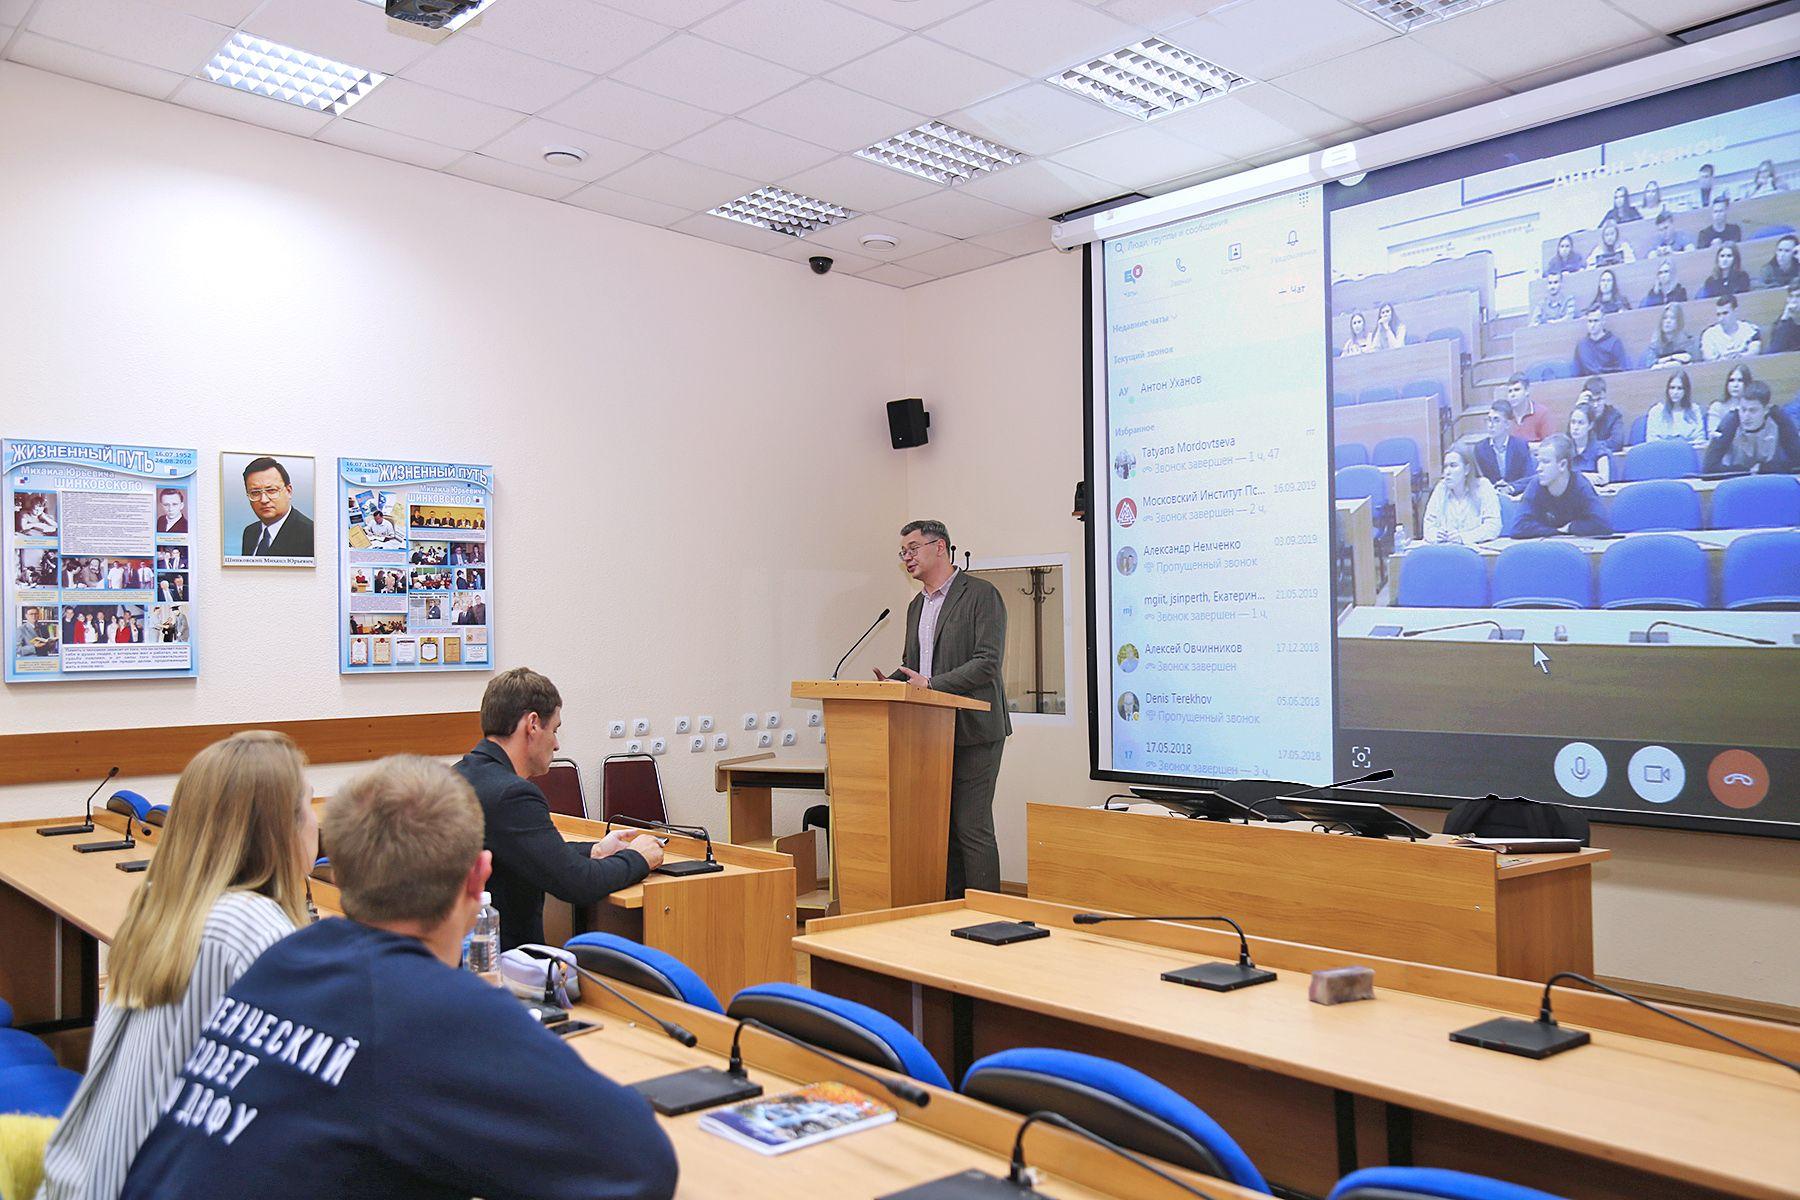 Осенняя цифровая школа во ВГУЭС: люди vs роботизированные технологии